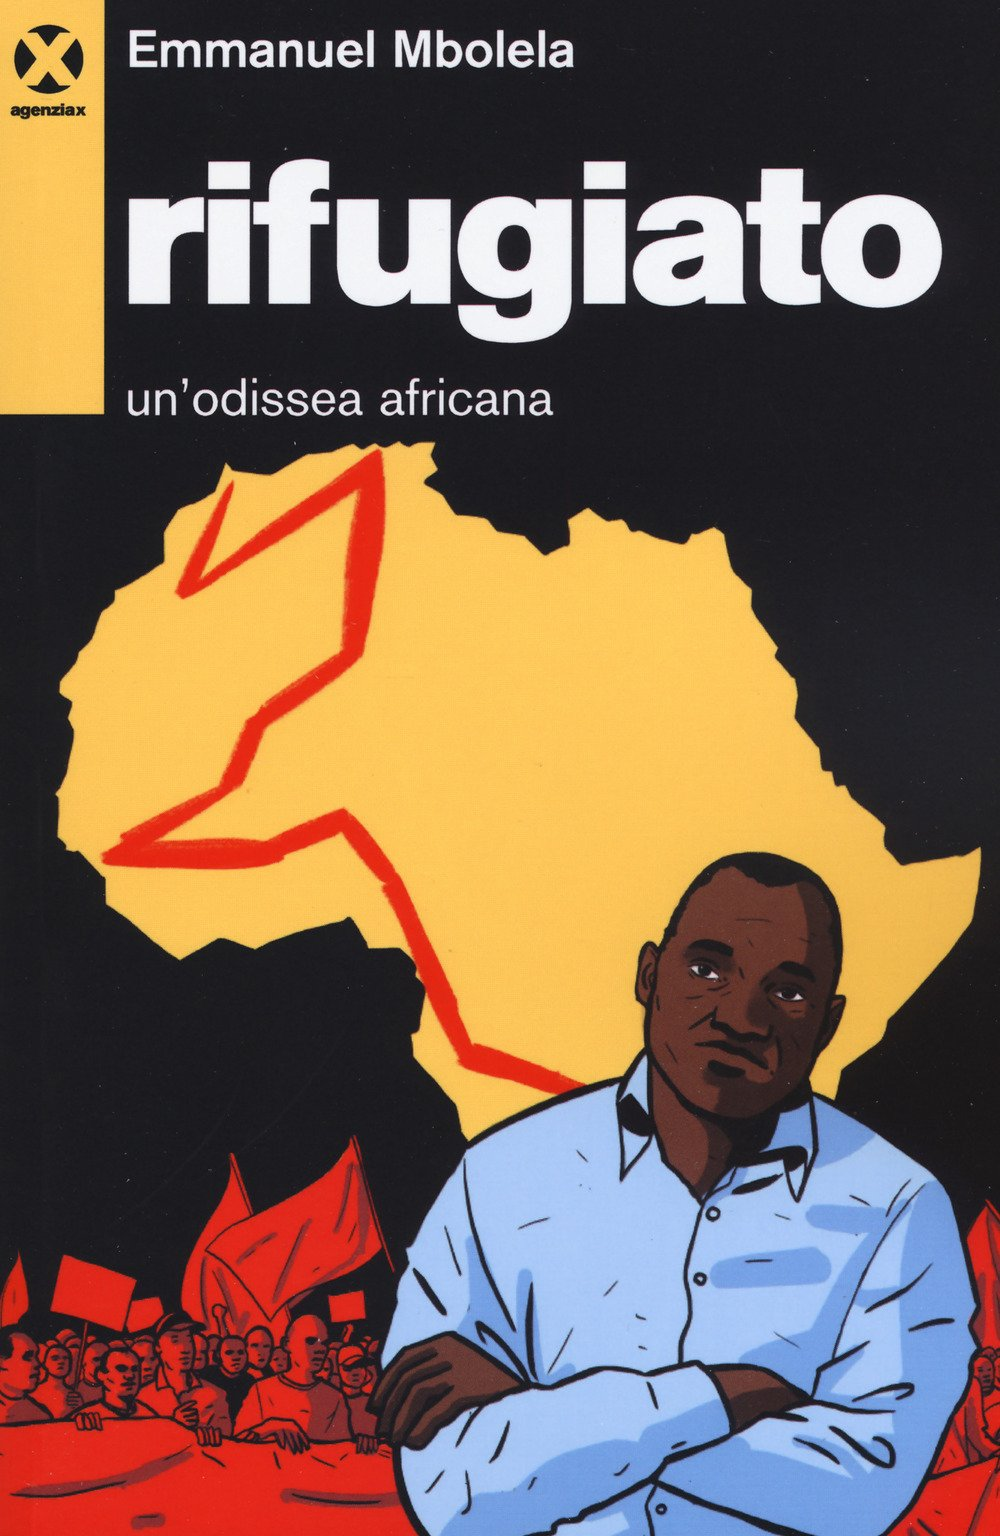 Rifugiato. Un'odissea africana